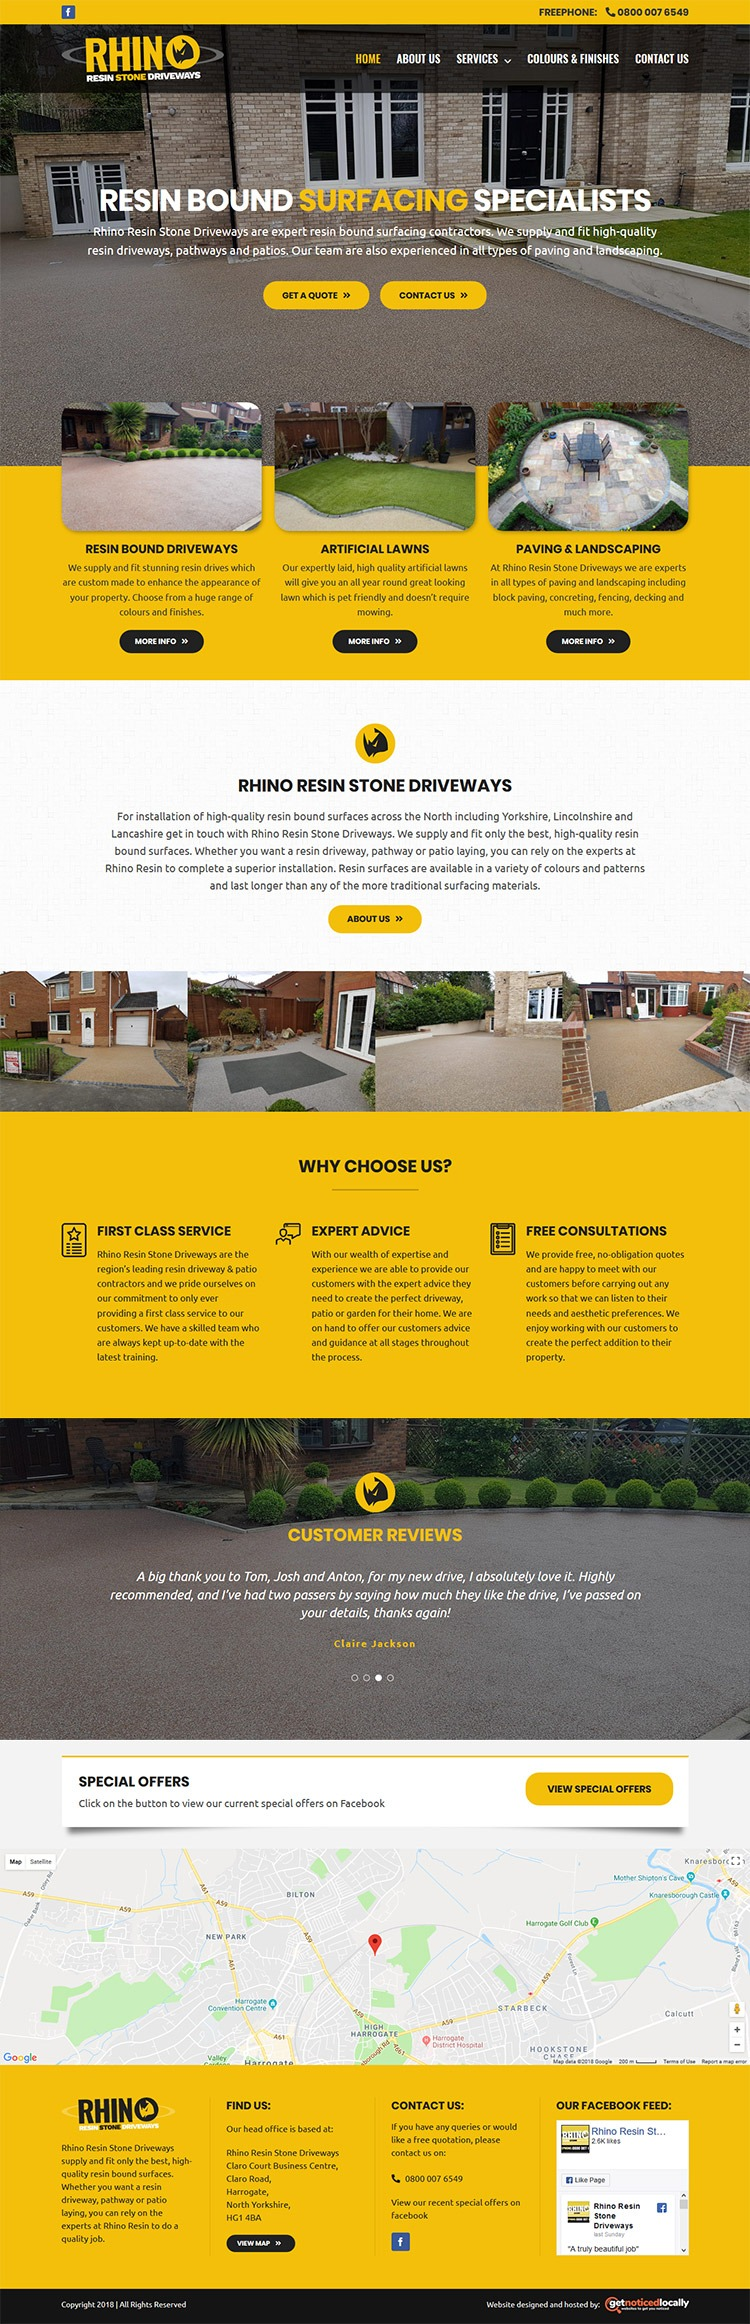 Rhino Resin website layout